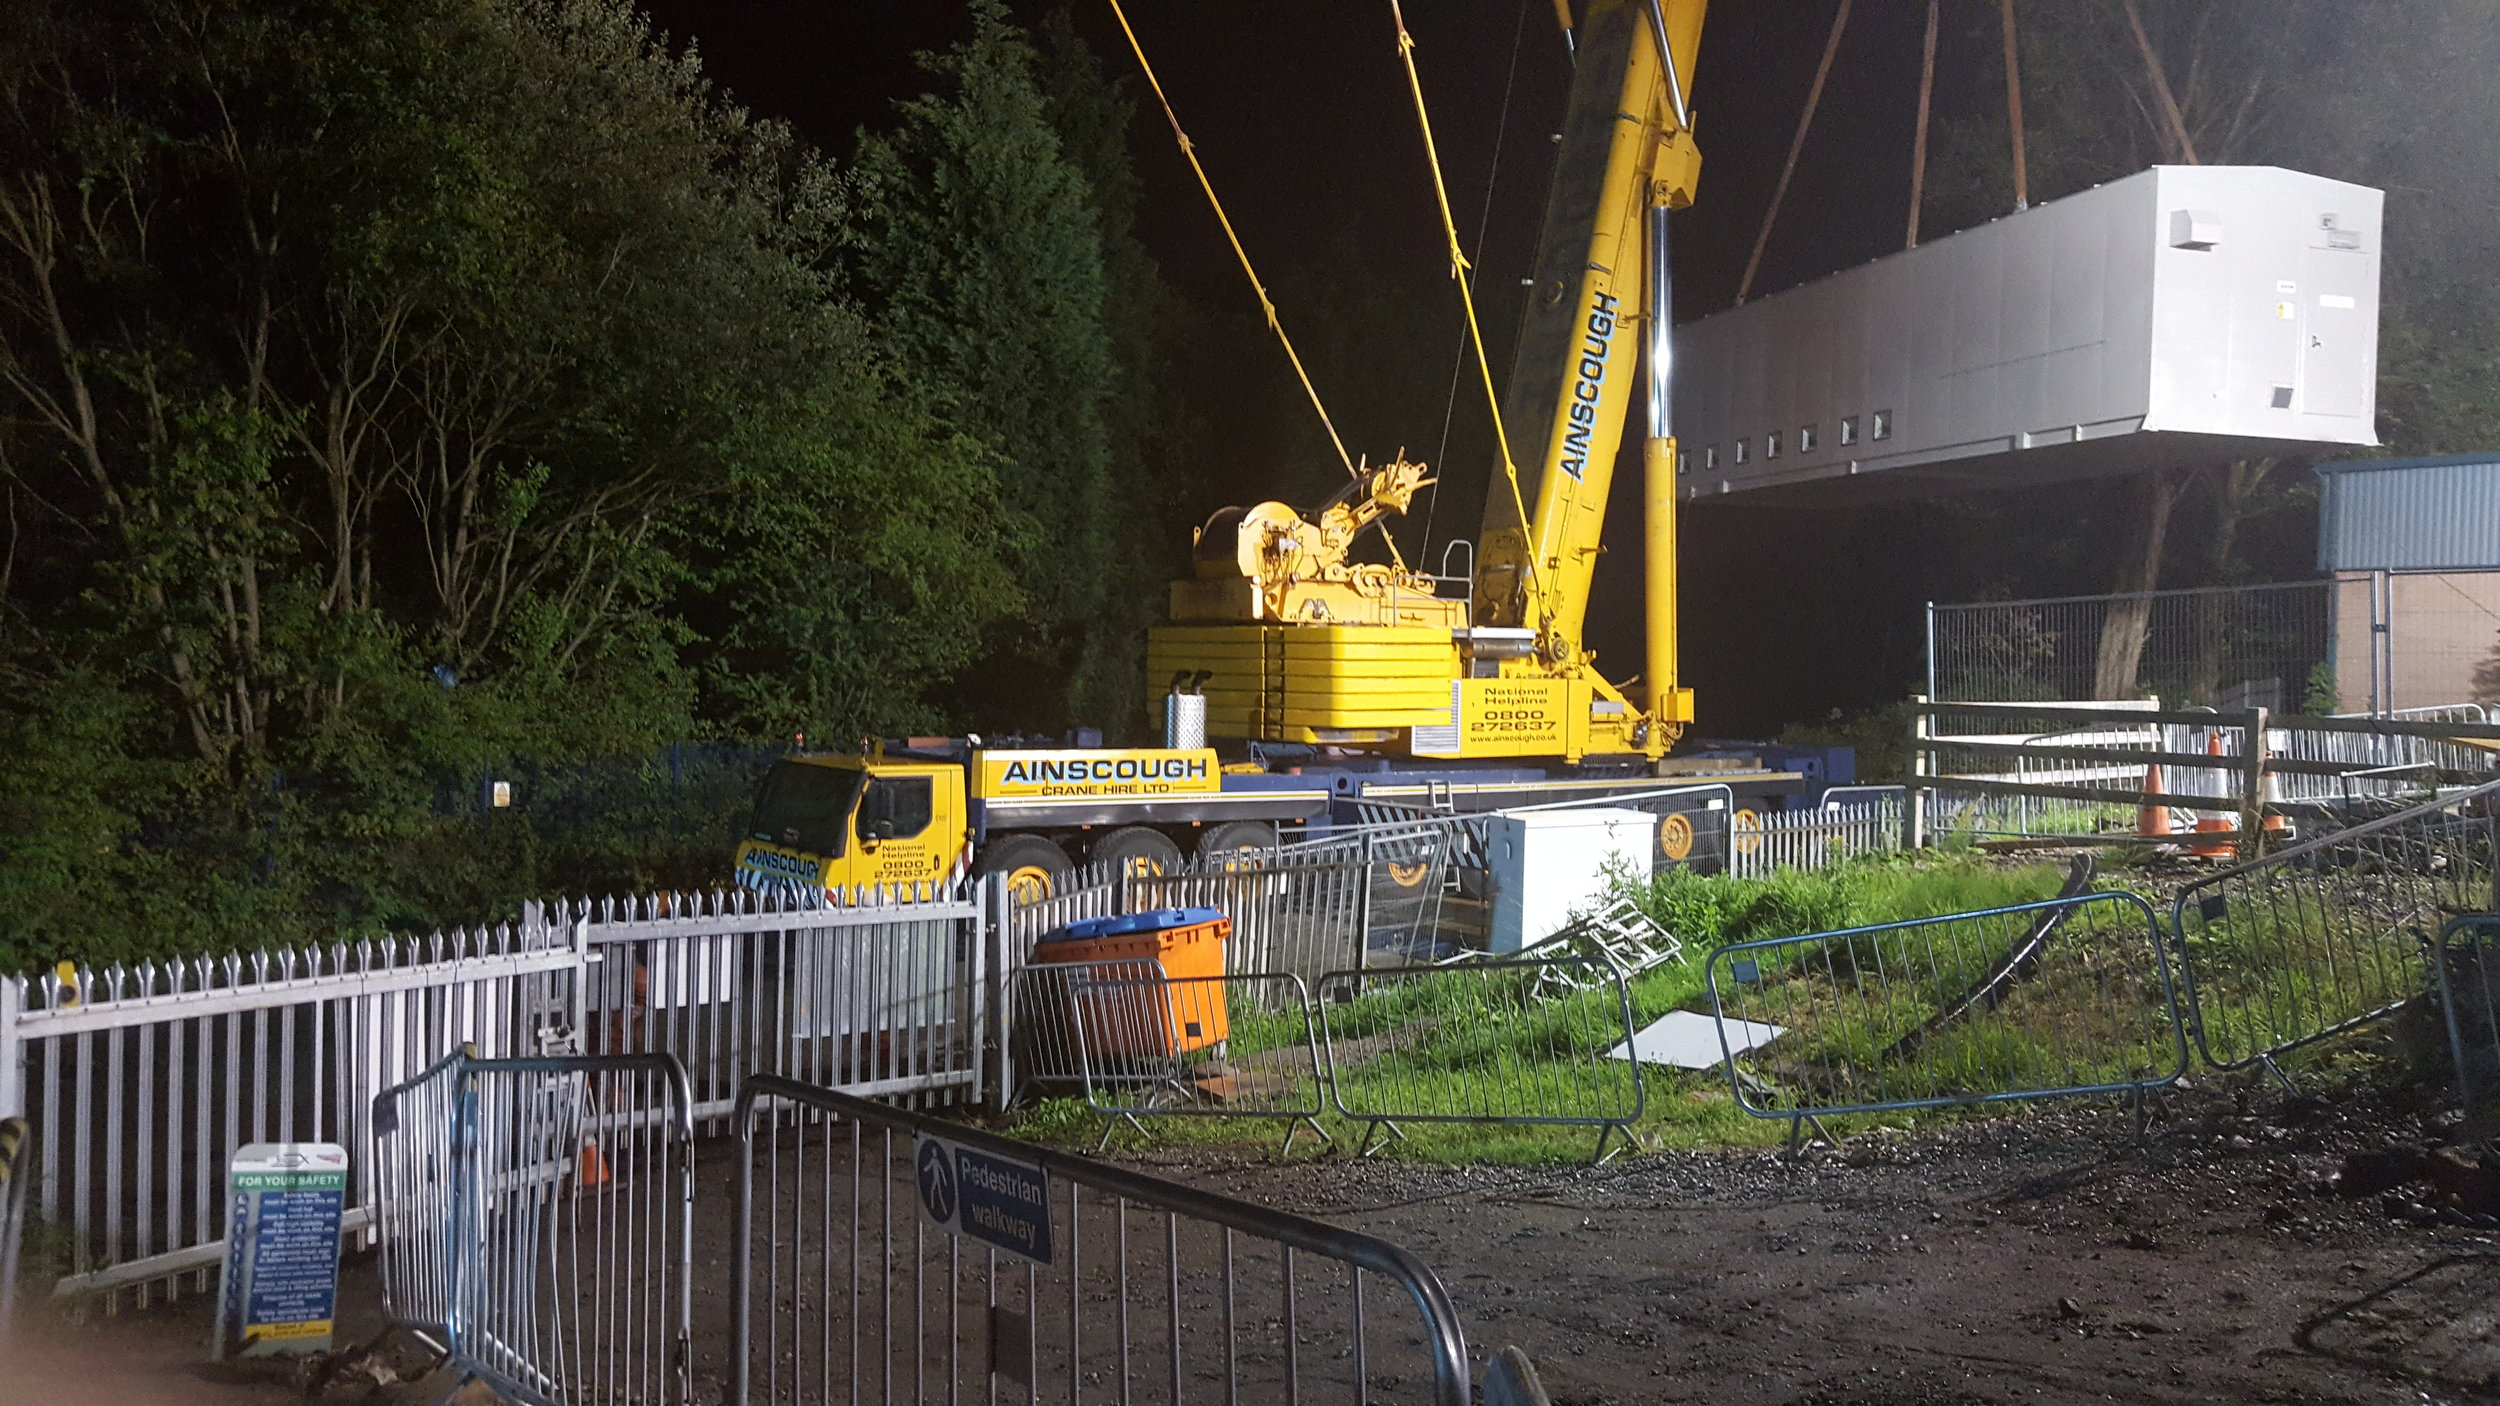 Image 1 - crane with substation.jpg